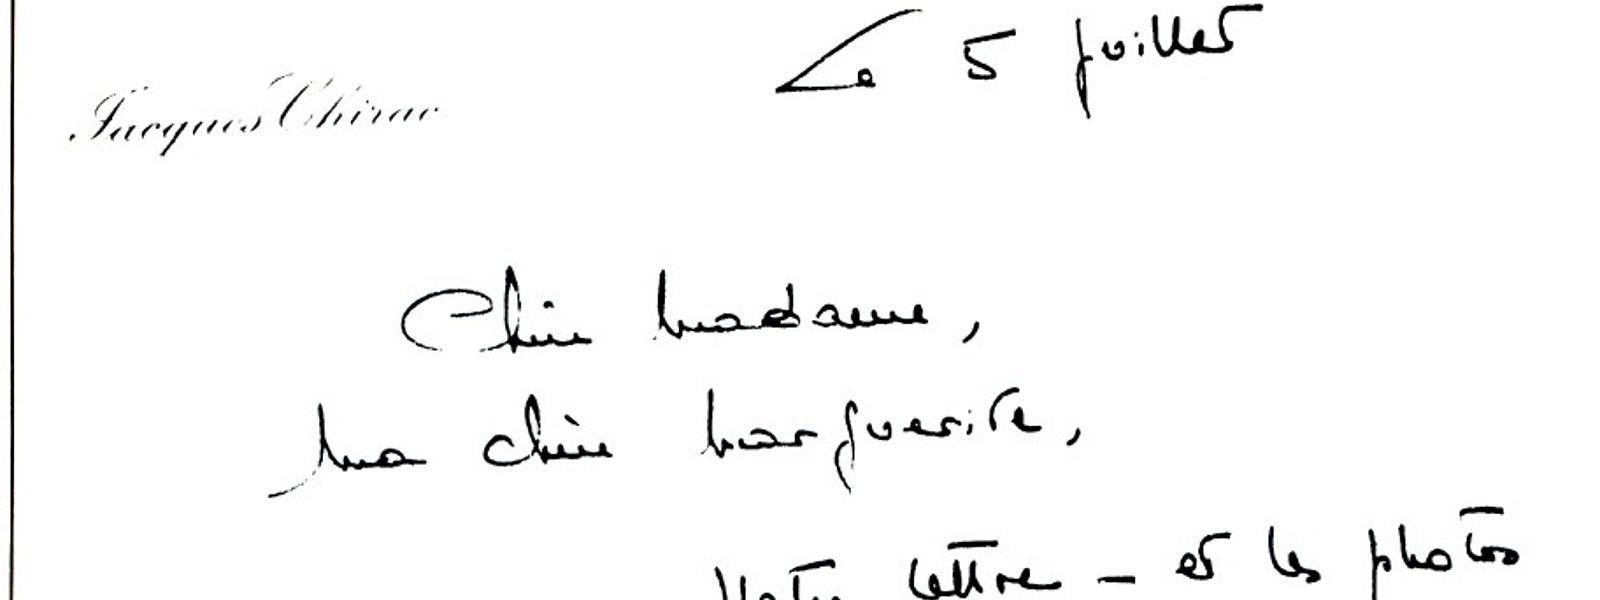 """Chère Madame, ma chère Marguerite""  so beginnt der Brief von Jacques Chirac."